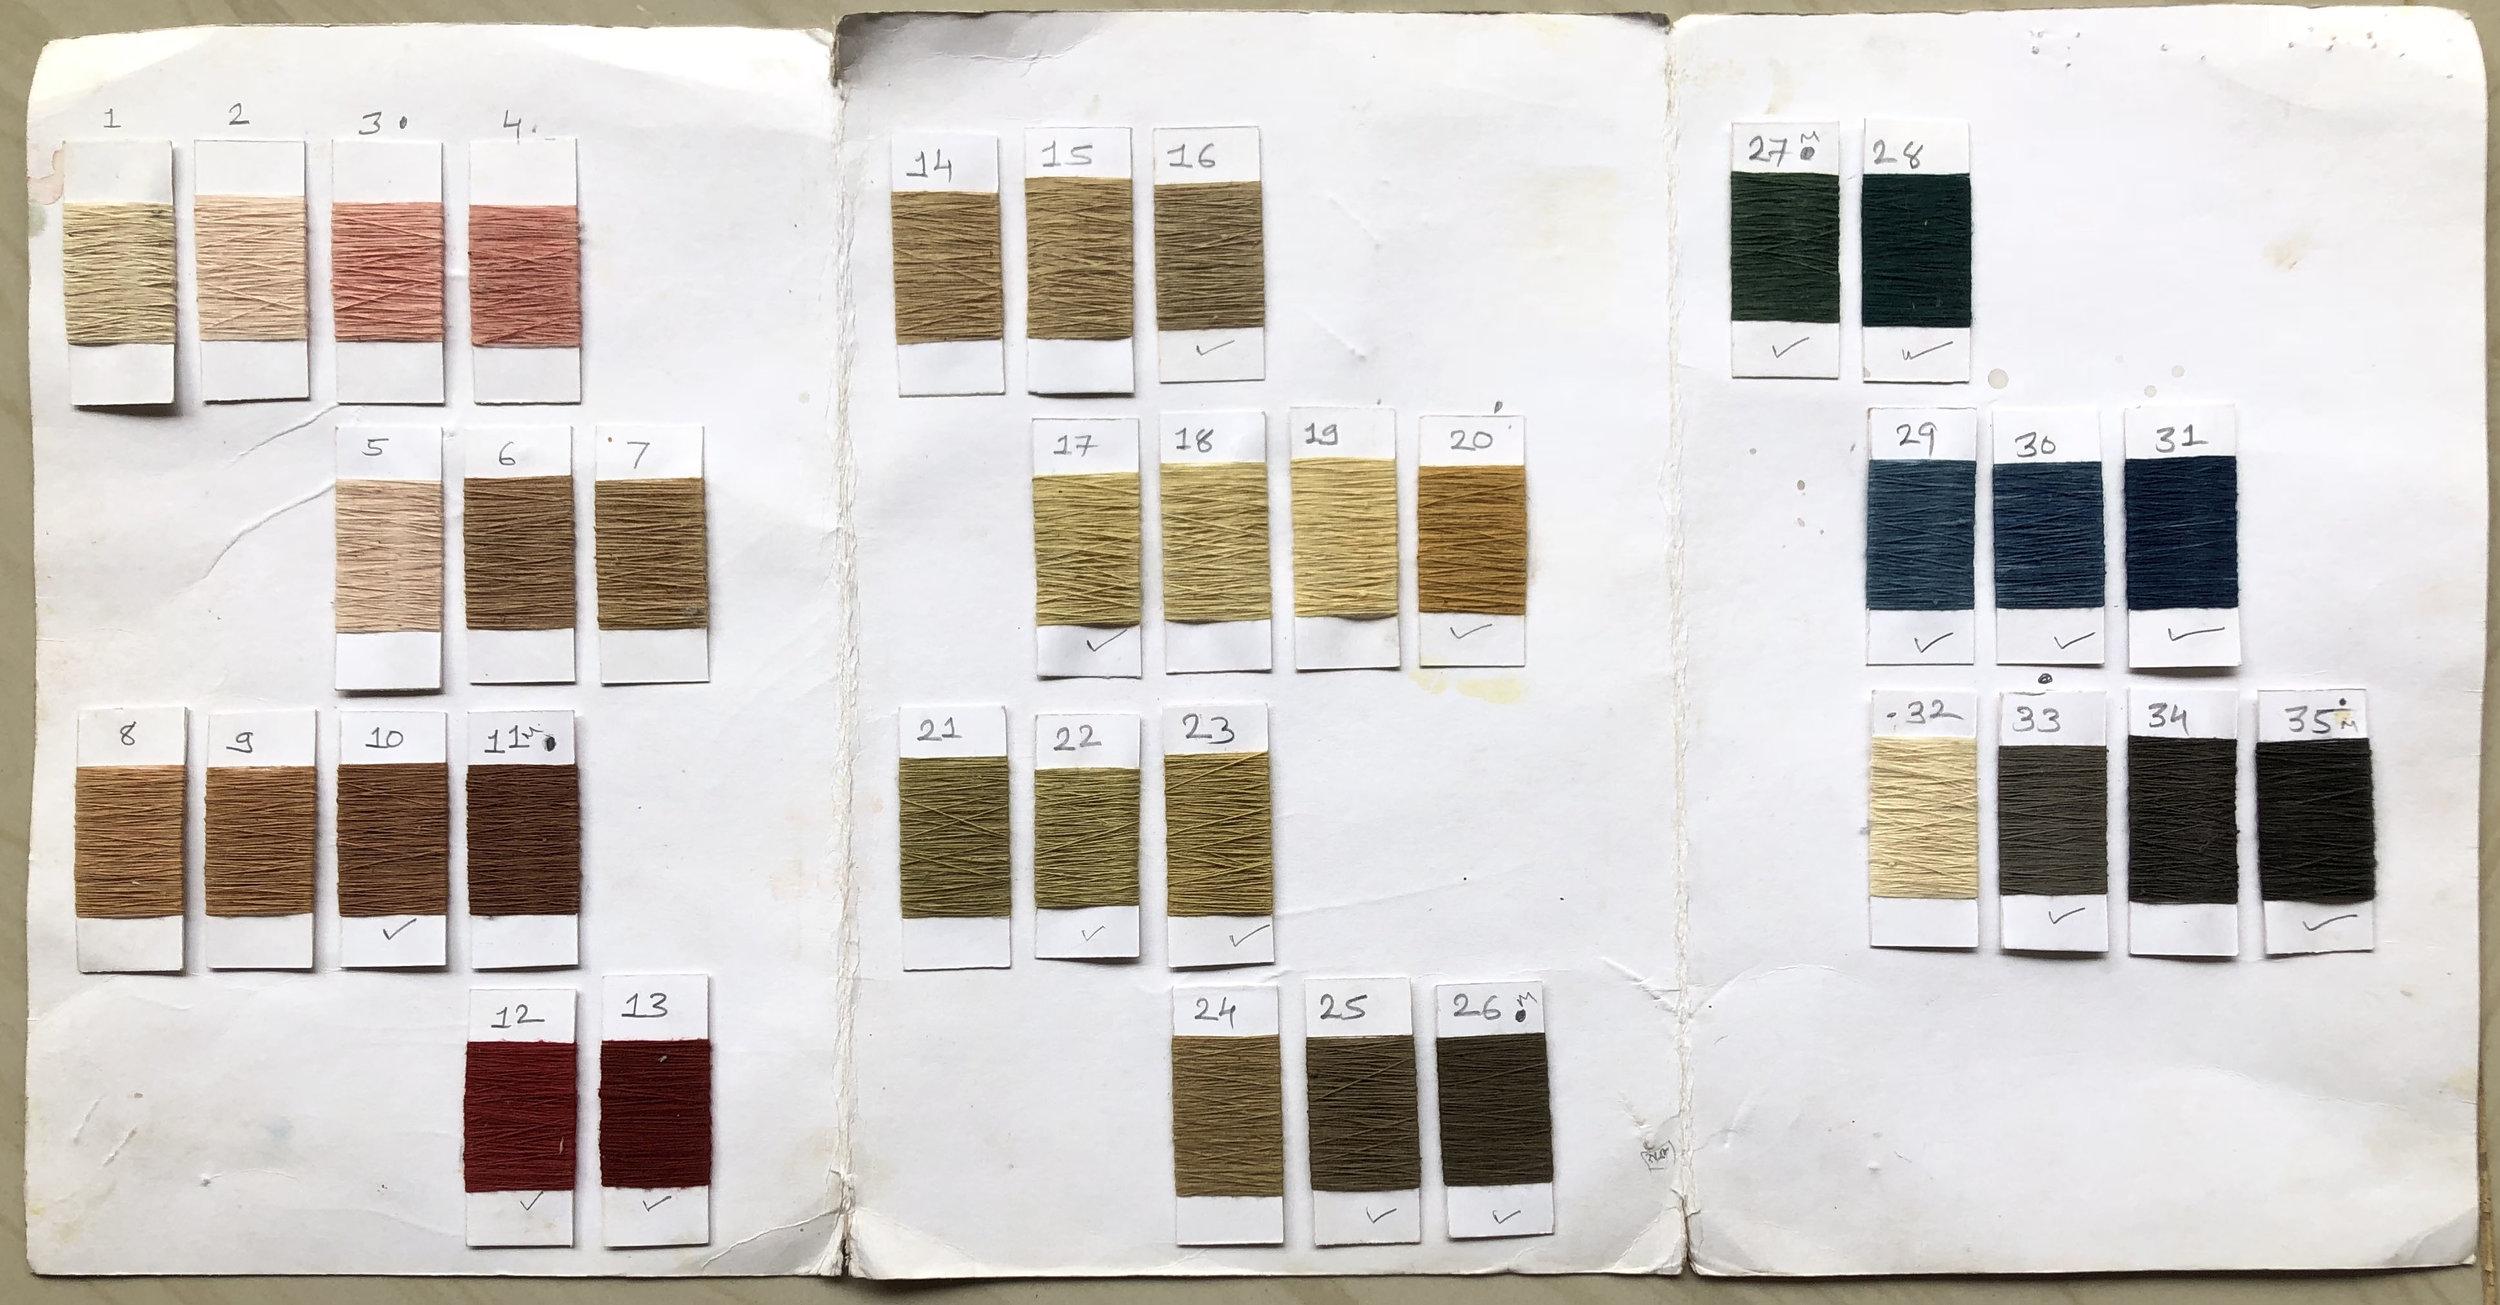 26_color chart.jpg